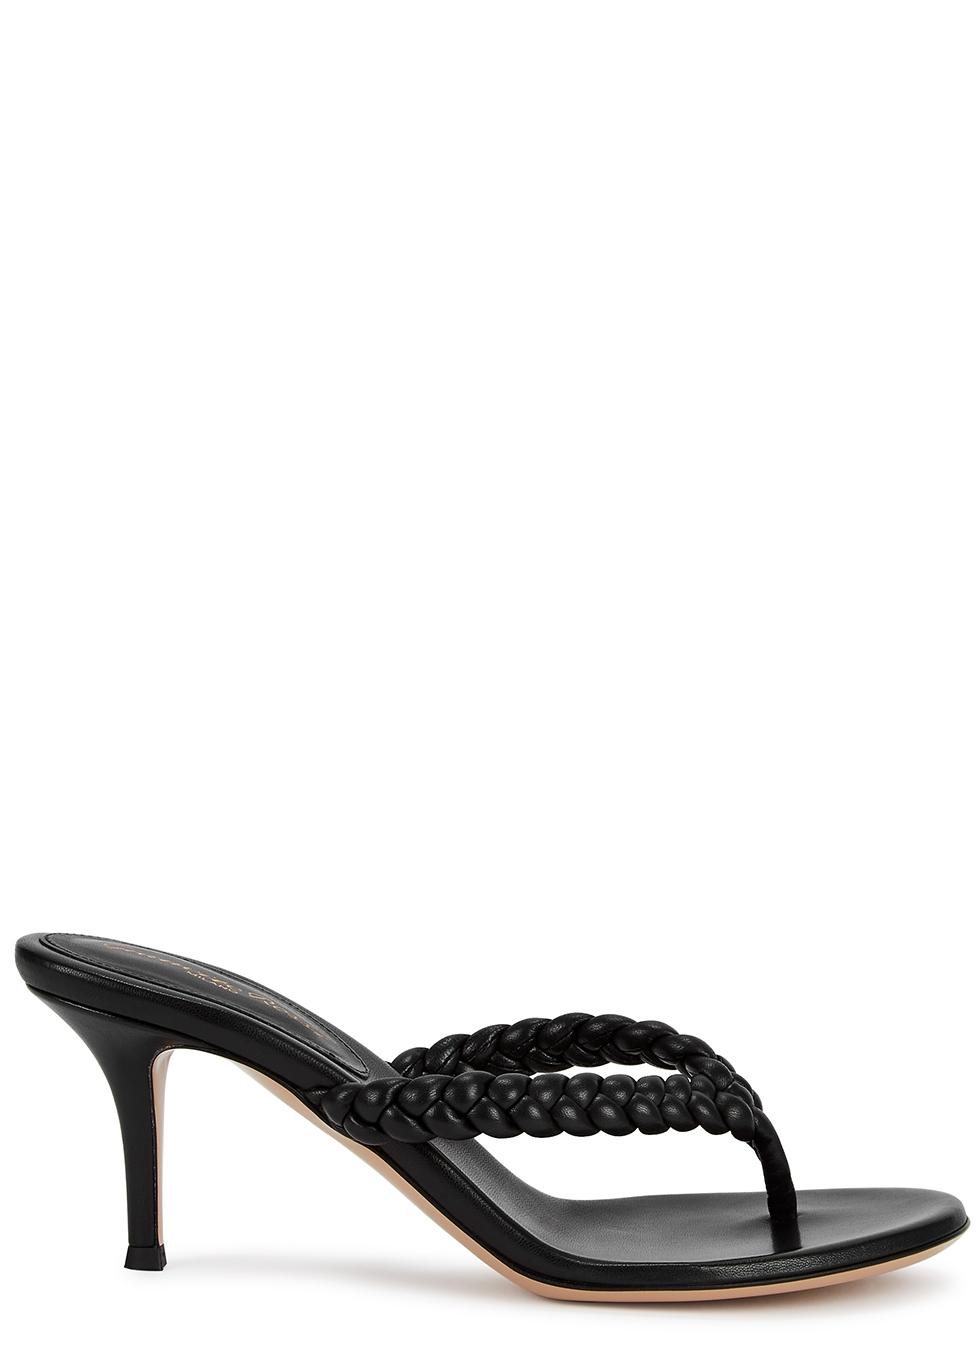 Tropea 70 black leather sandals